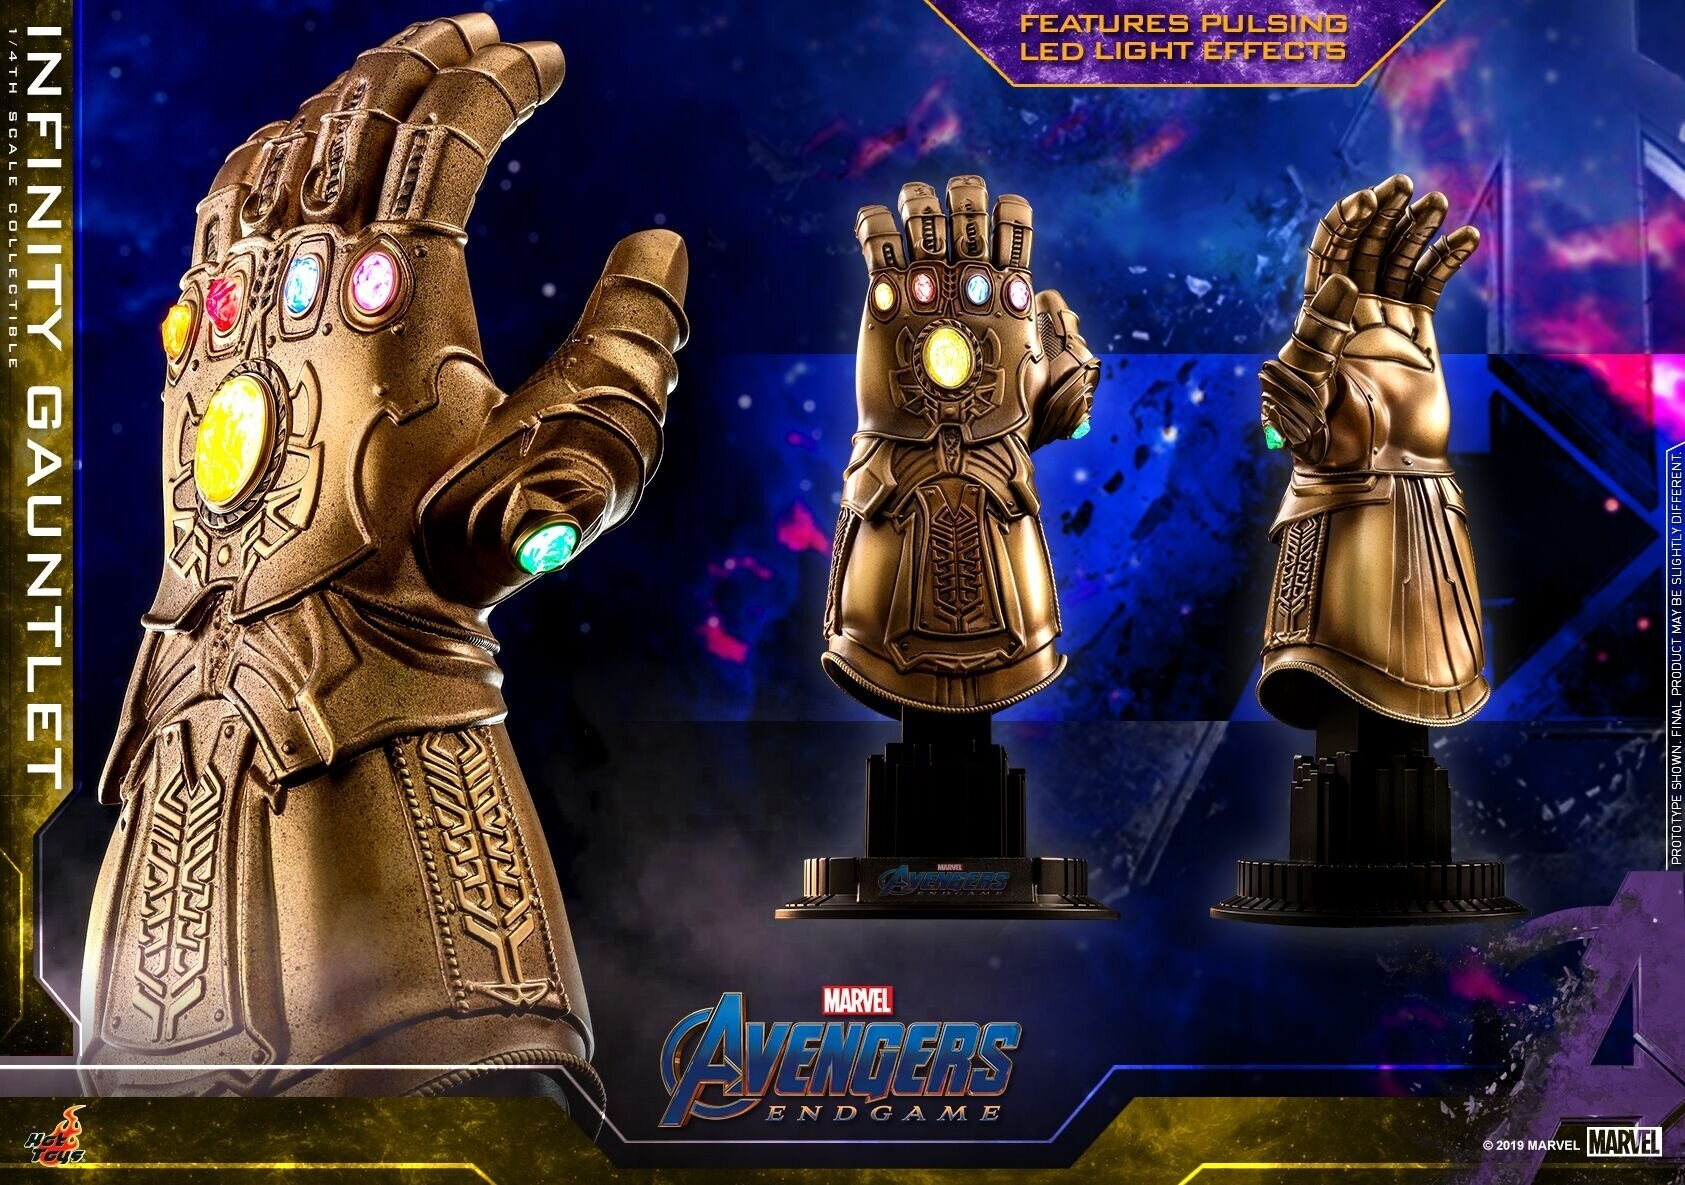 [Hot Toys] 어벤져스 : 엔드게임 인피니티 건틀렛 ACS007 - 1/4th scale Infinity Gauntlet Collectible